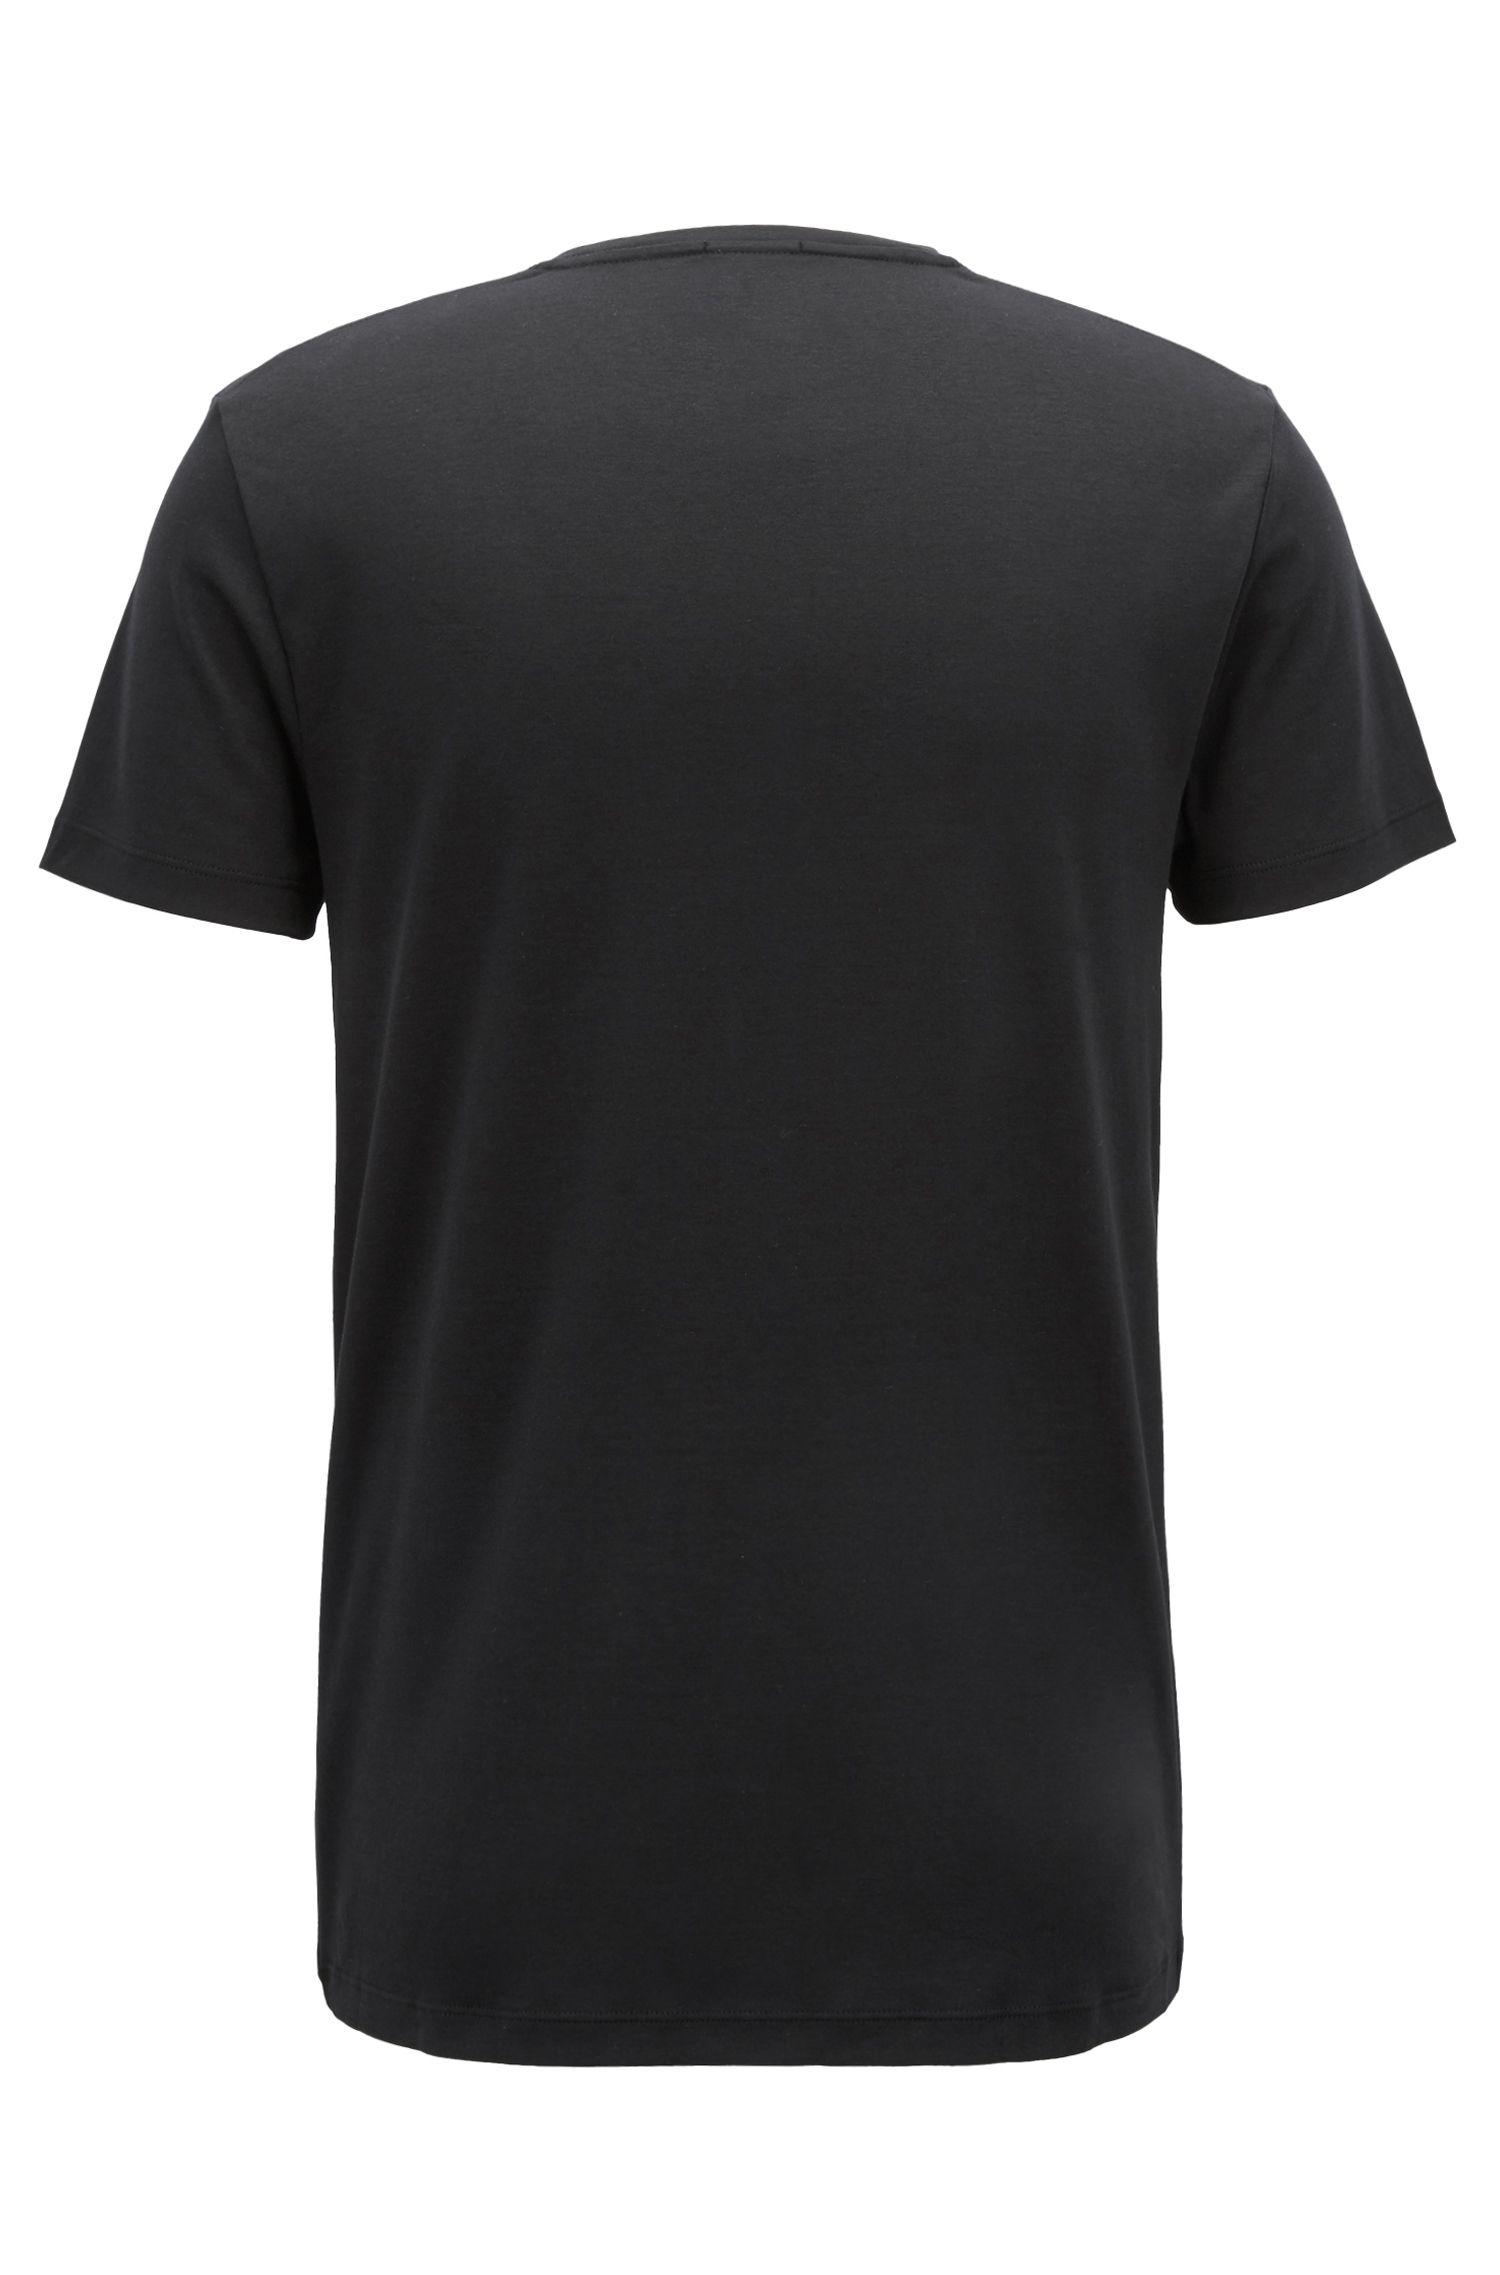 Slim-fit T-shirt in cotton with velvet logo, Black